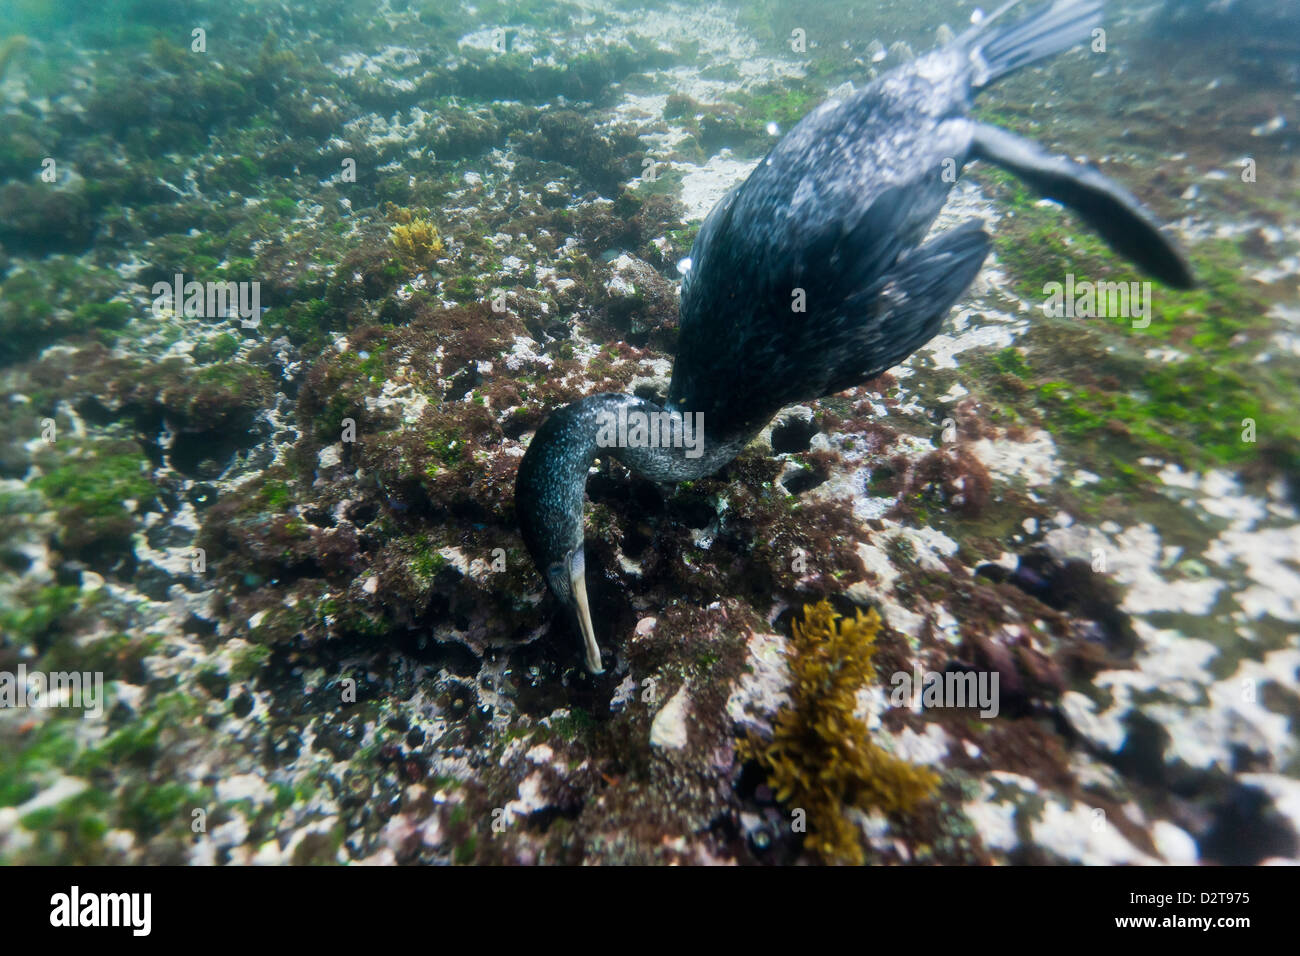 Flightless cormorant (Nannopterum harrisi) hunting underwater, Tagus Cove, Isabela Island, Galapagos Islands, Ecuador - Stock Image